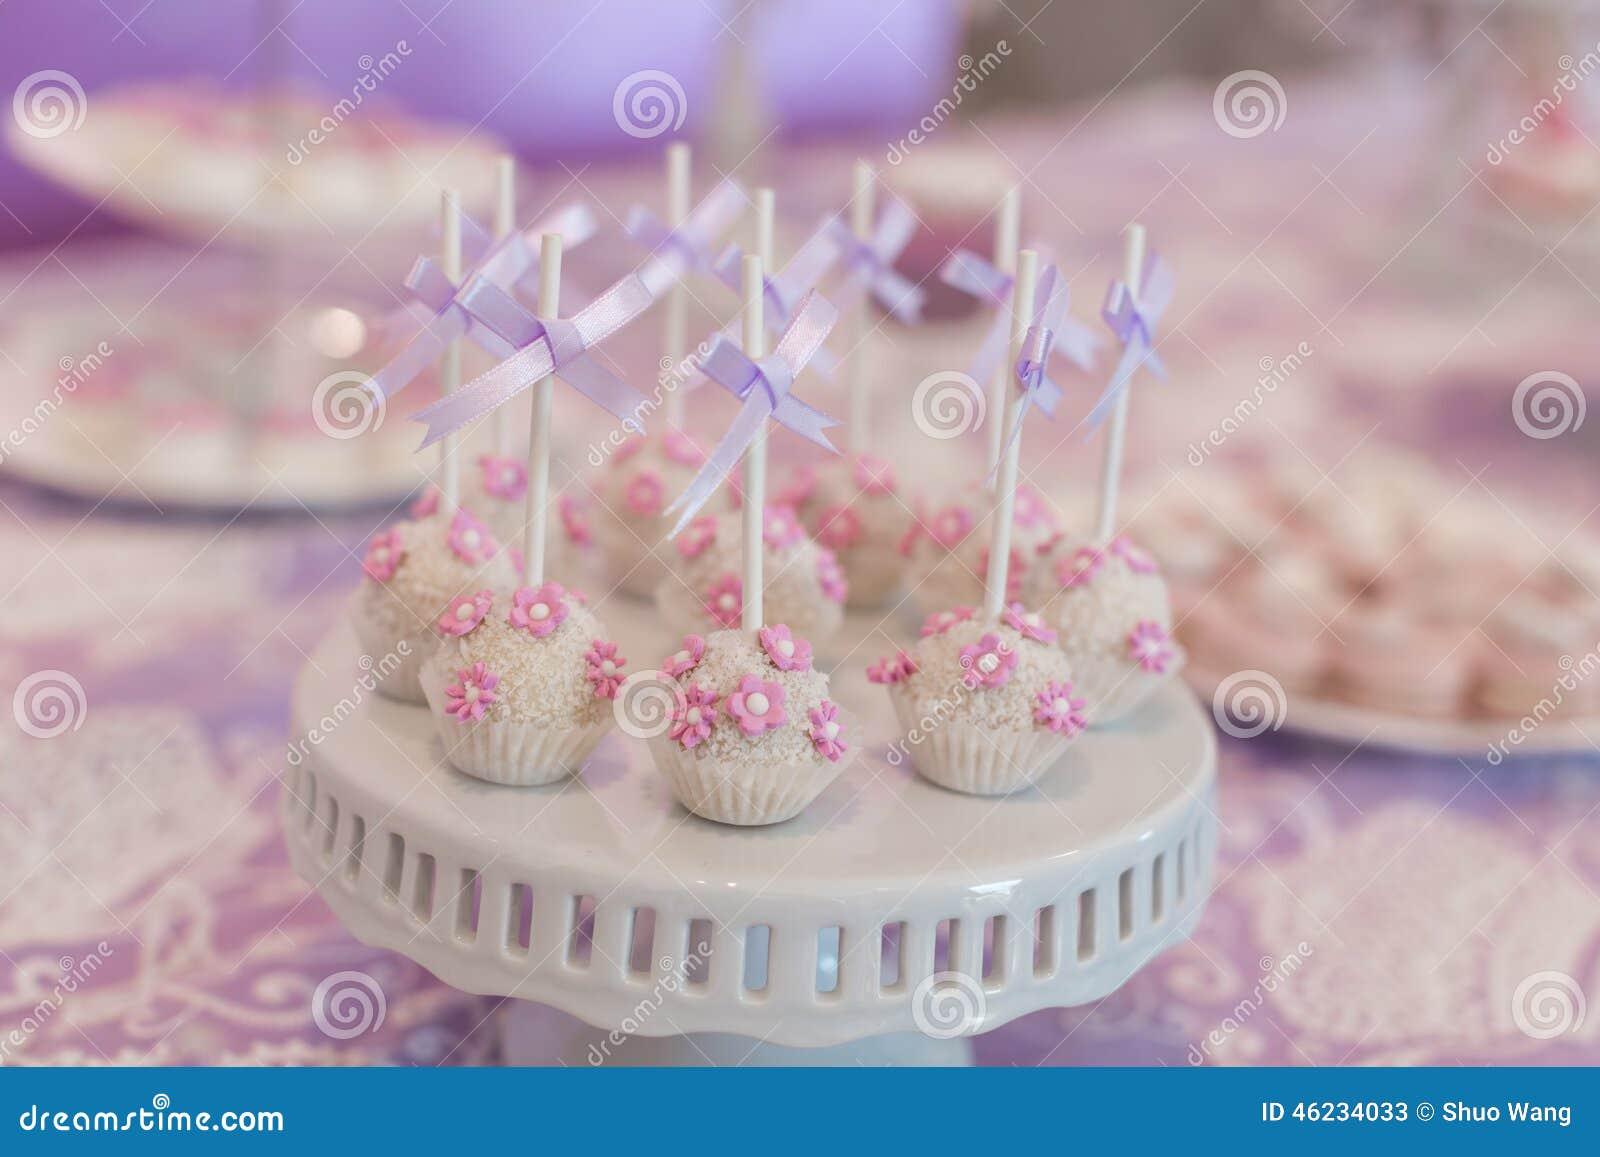 Estallido de la torta